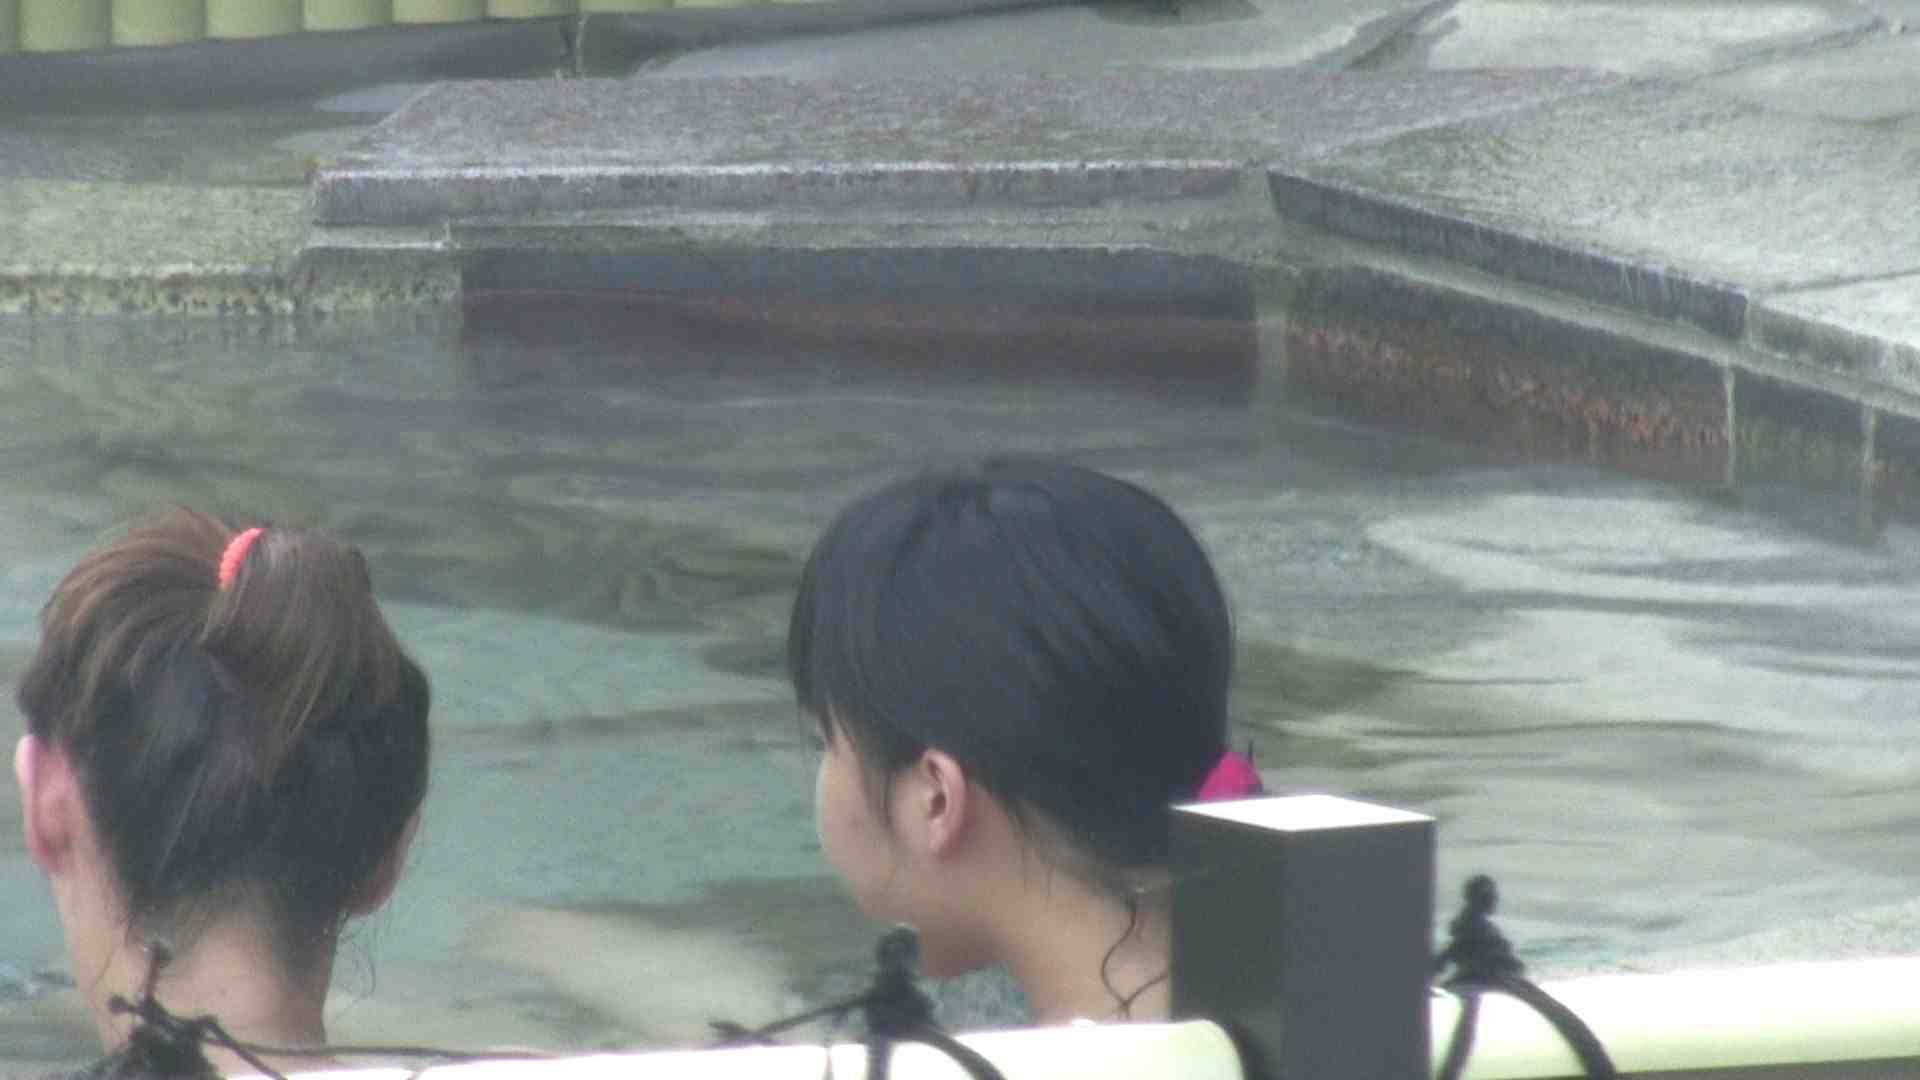 Aquaな露天風呂Vol.196 HなOL | 盗撮  91pic 29